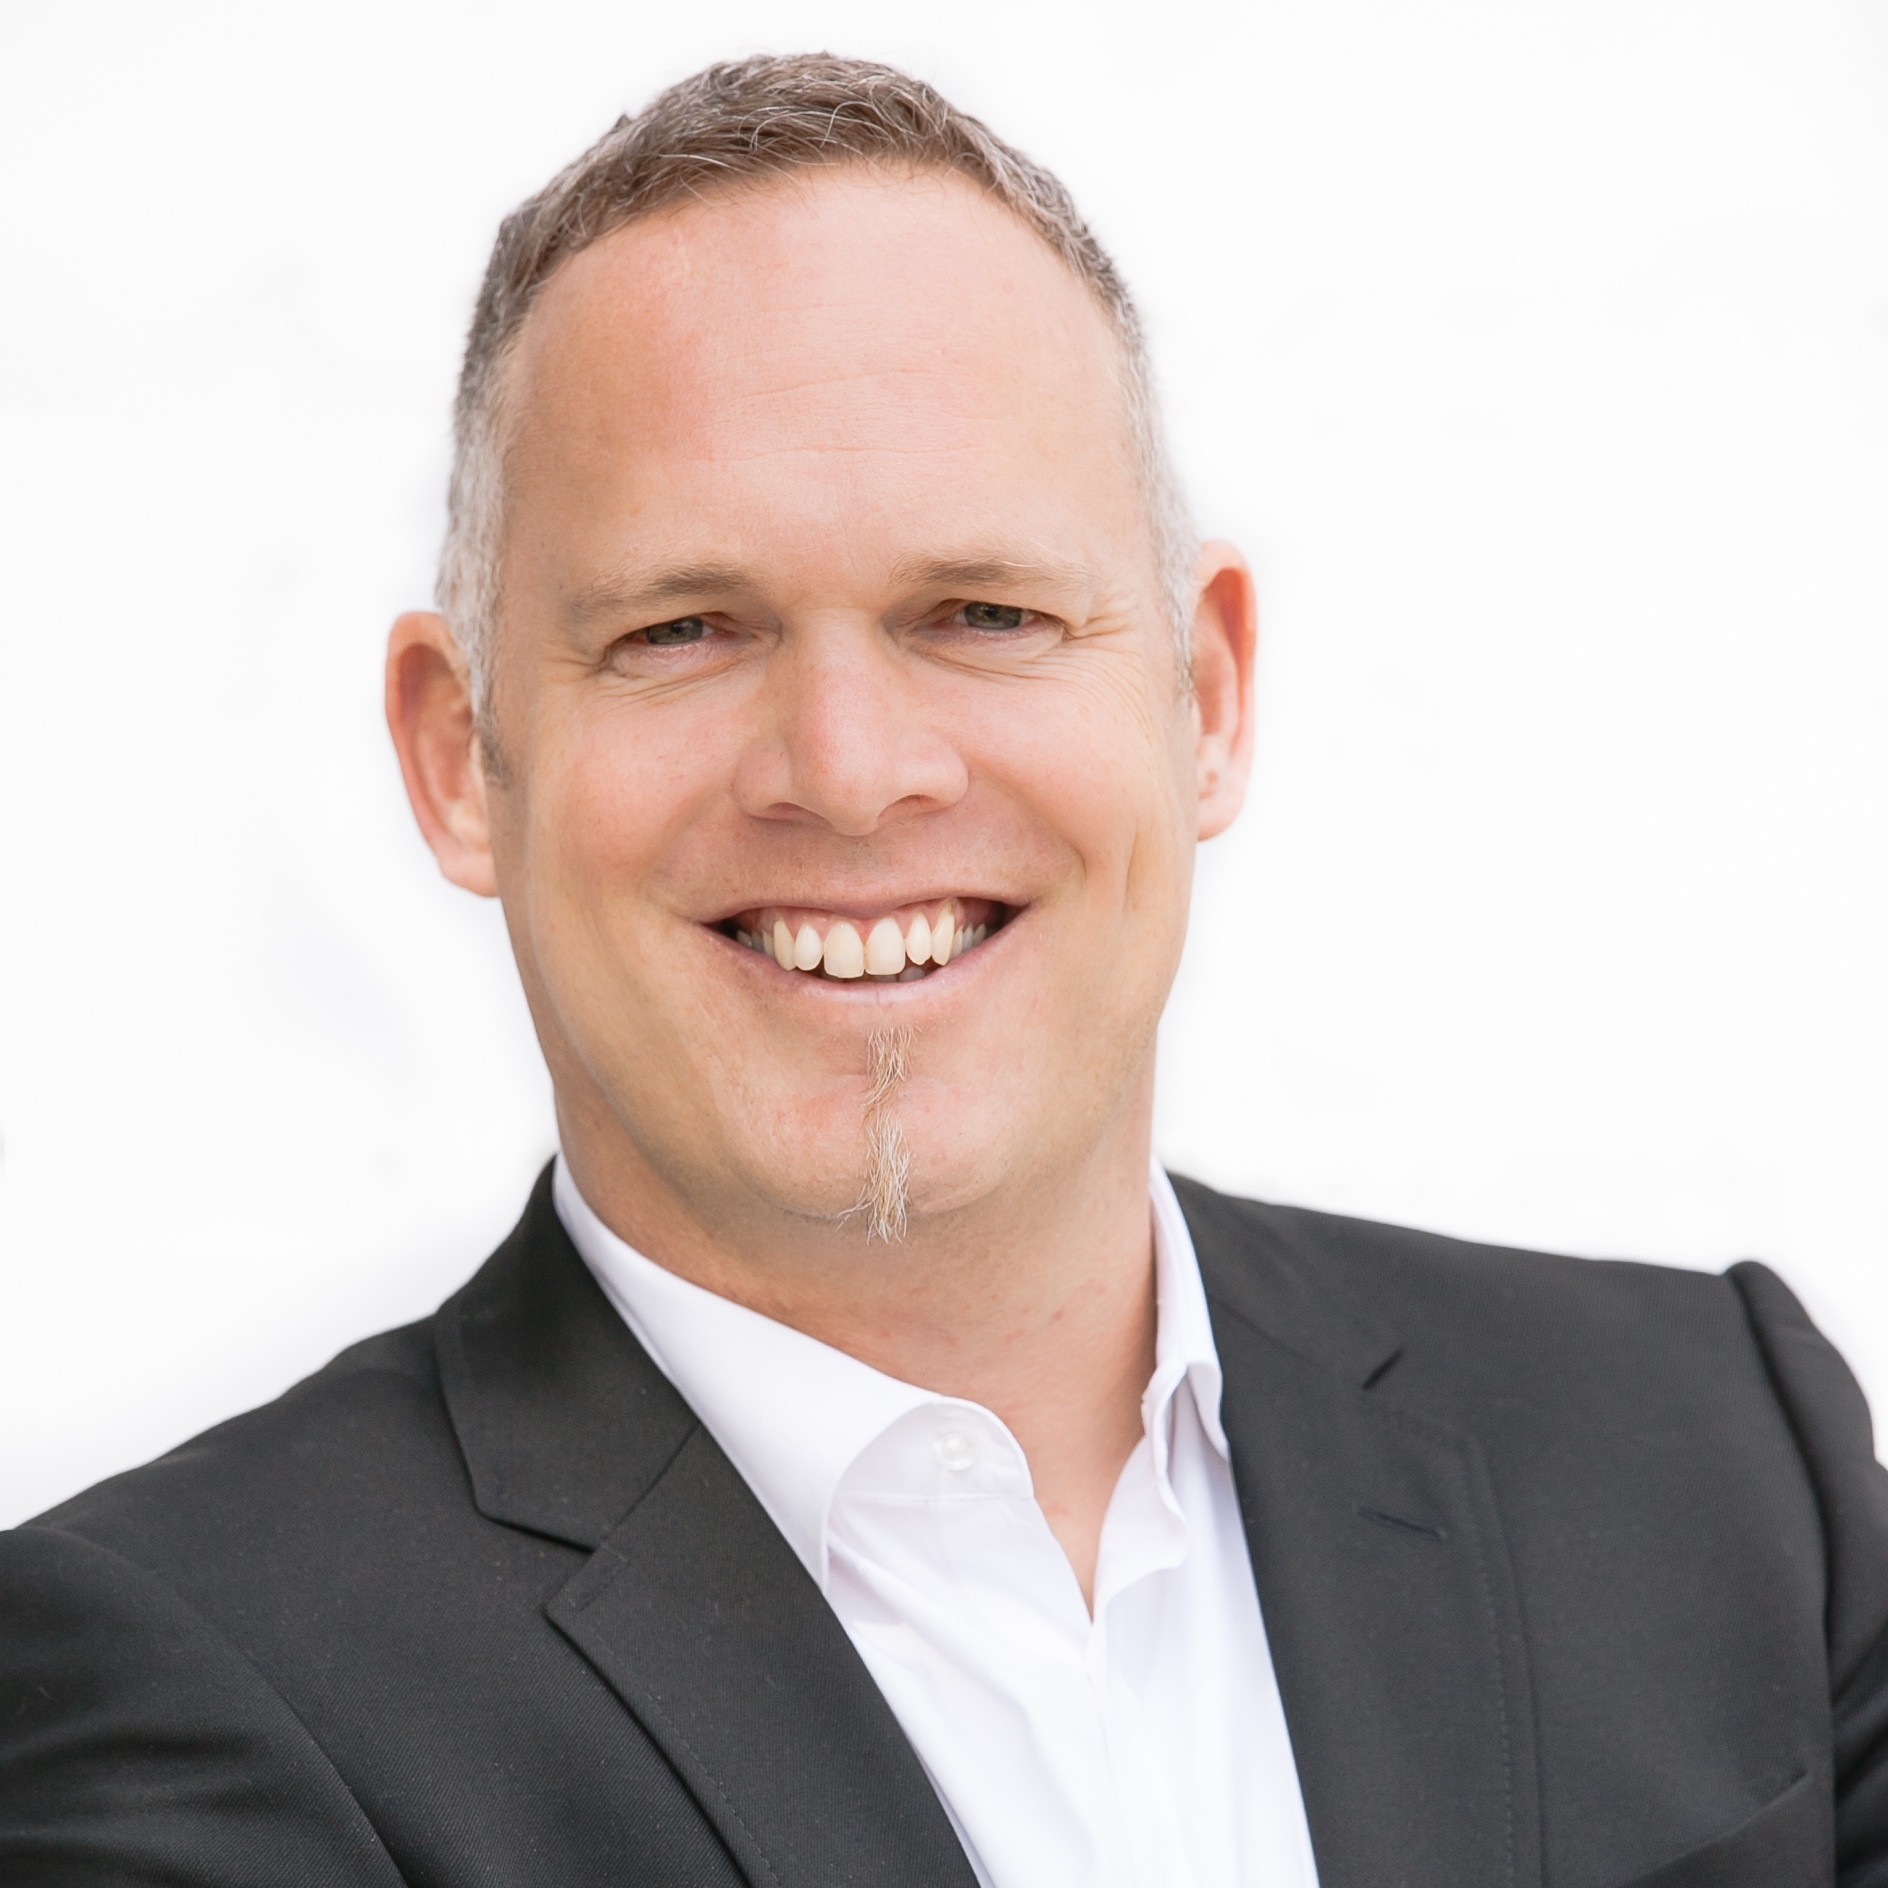 Boris von Bormann - Founder, renu VenturesBoris was an exCEO of Mercedes - Benz Energy, specializing in mobility and energy transformation. He cofound Sonnen, a Unicorn startup in IOT.Boris曾担任梅赛德斯-奔驰能源公司CEO,负责储能系统的发展。曾联合创立物联网独角兽公司Sonnen。